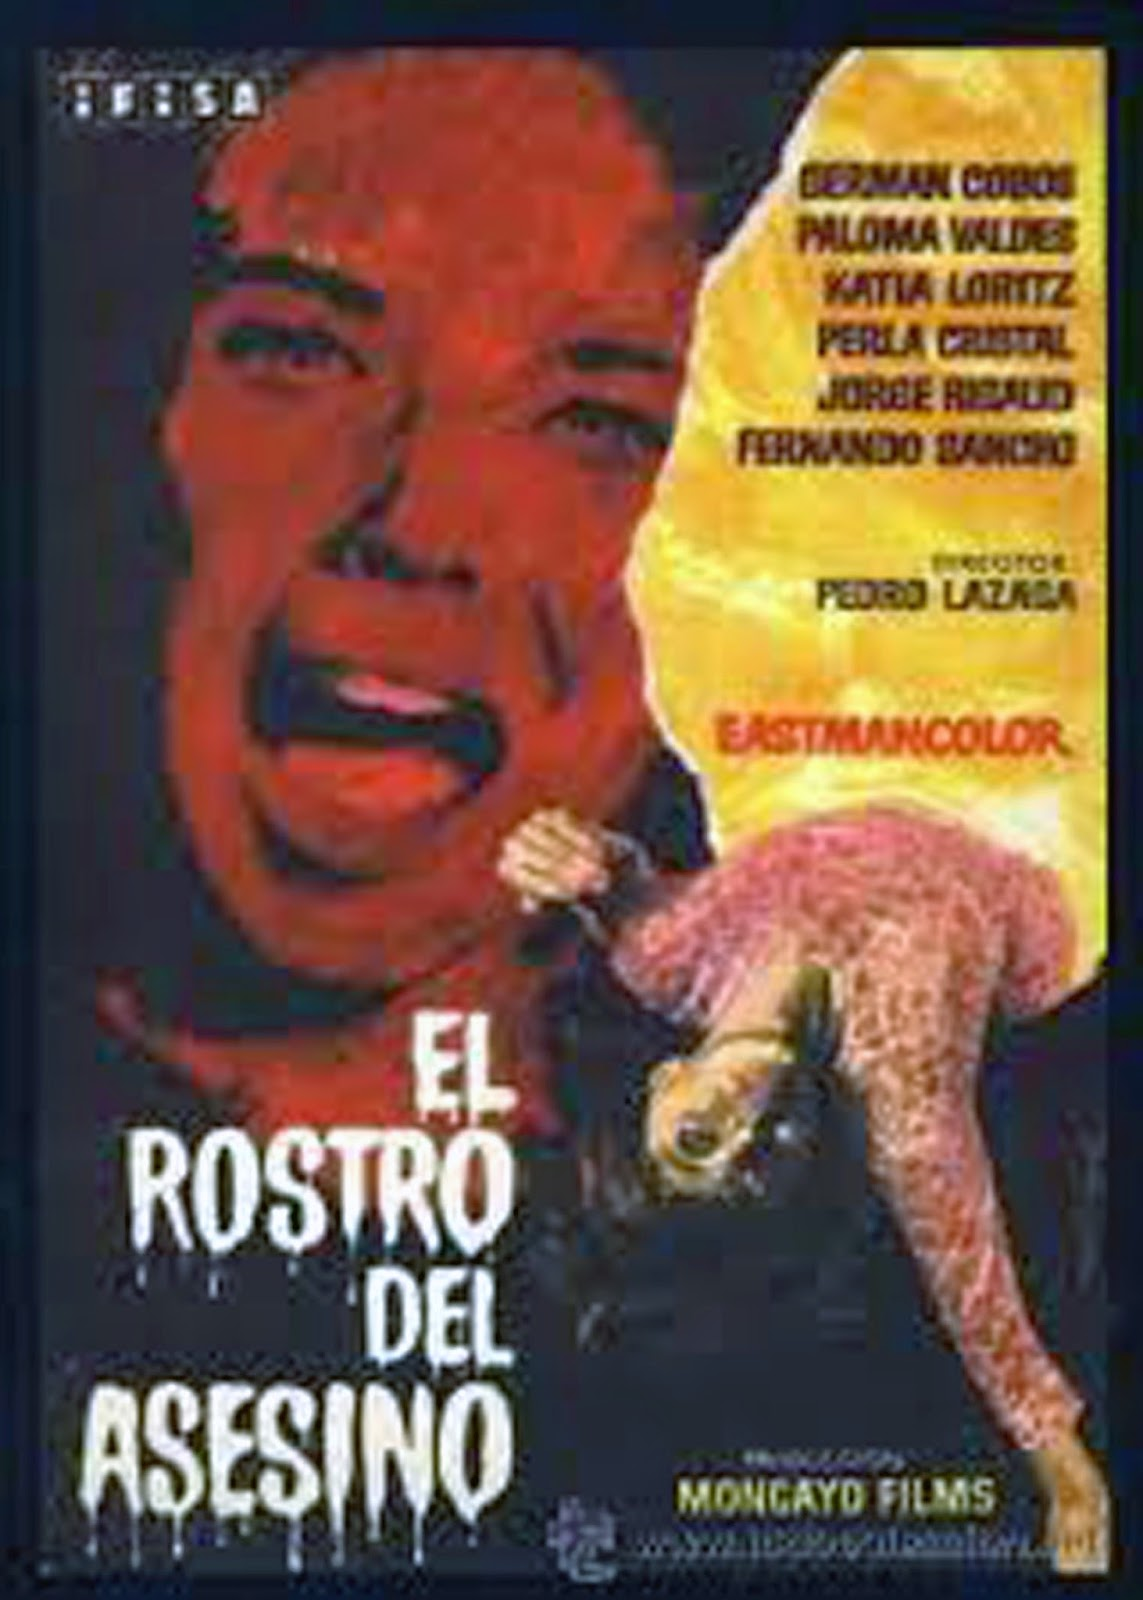 El rostro del asesino (1965)